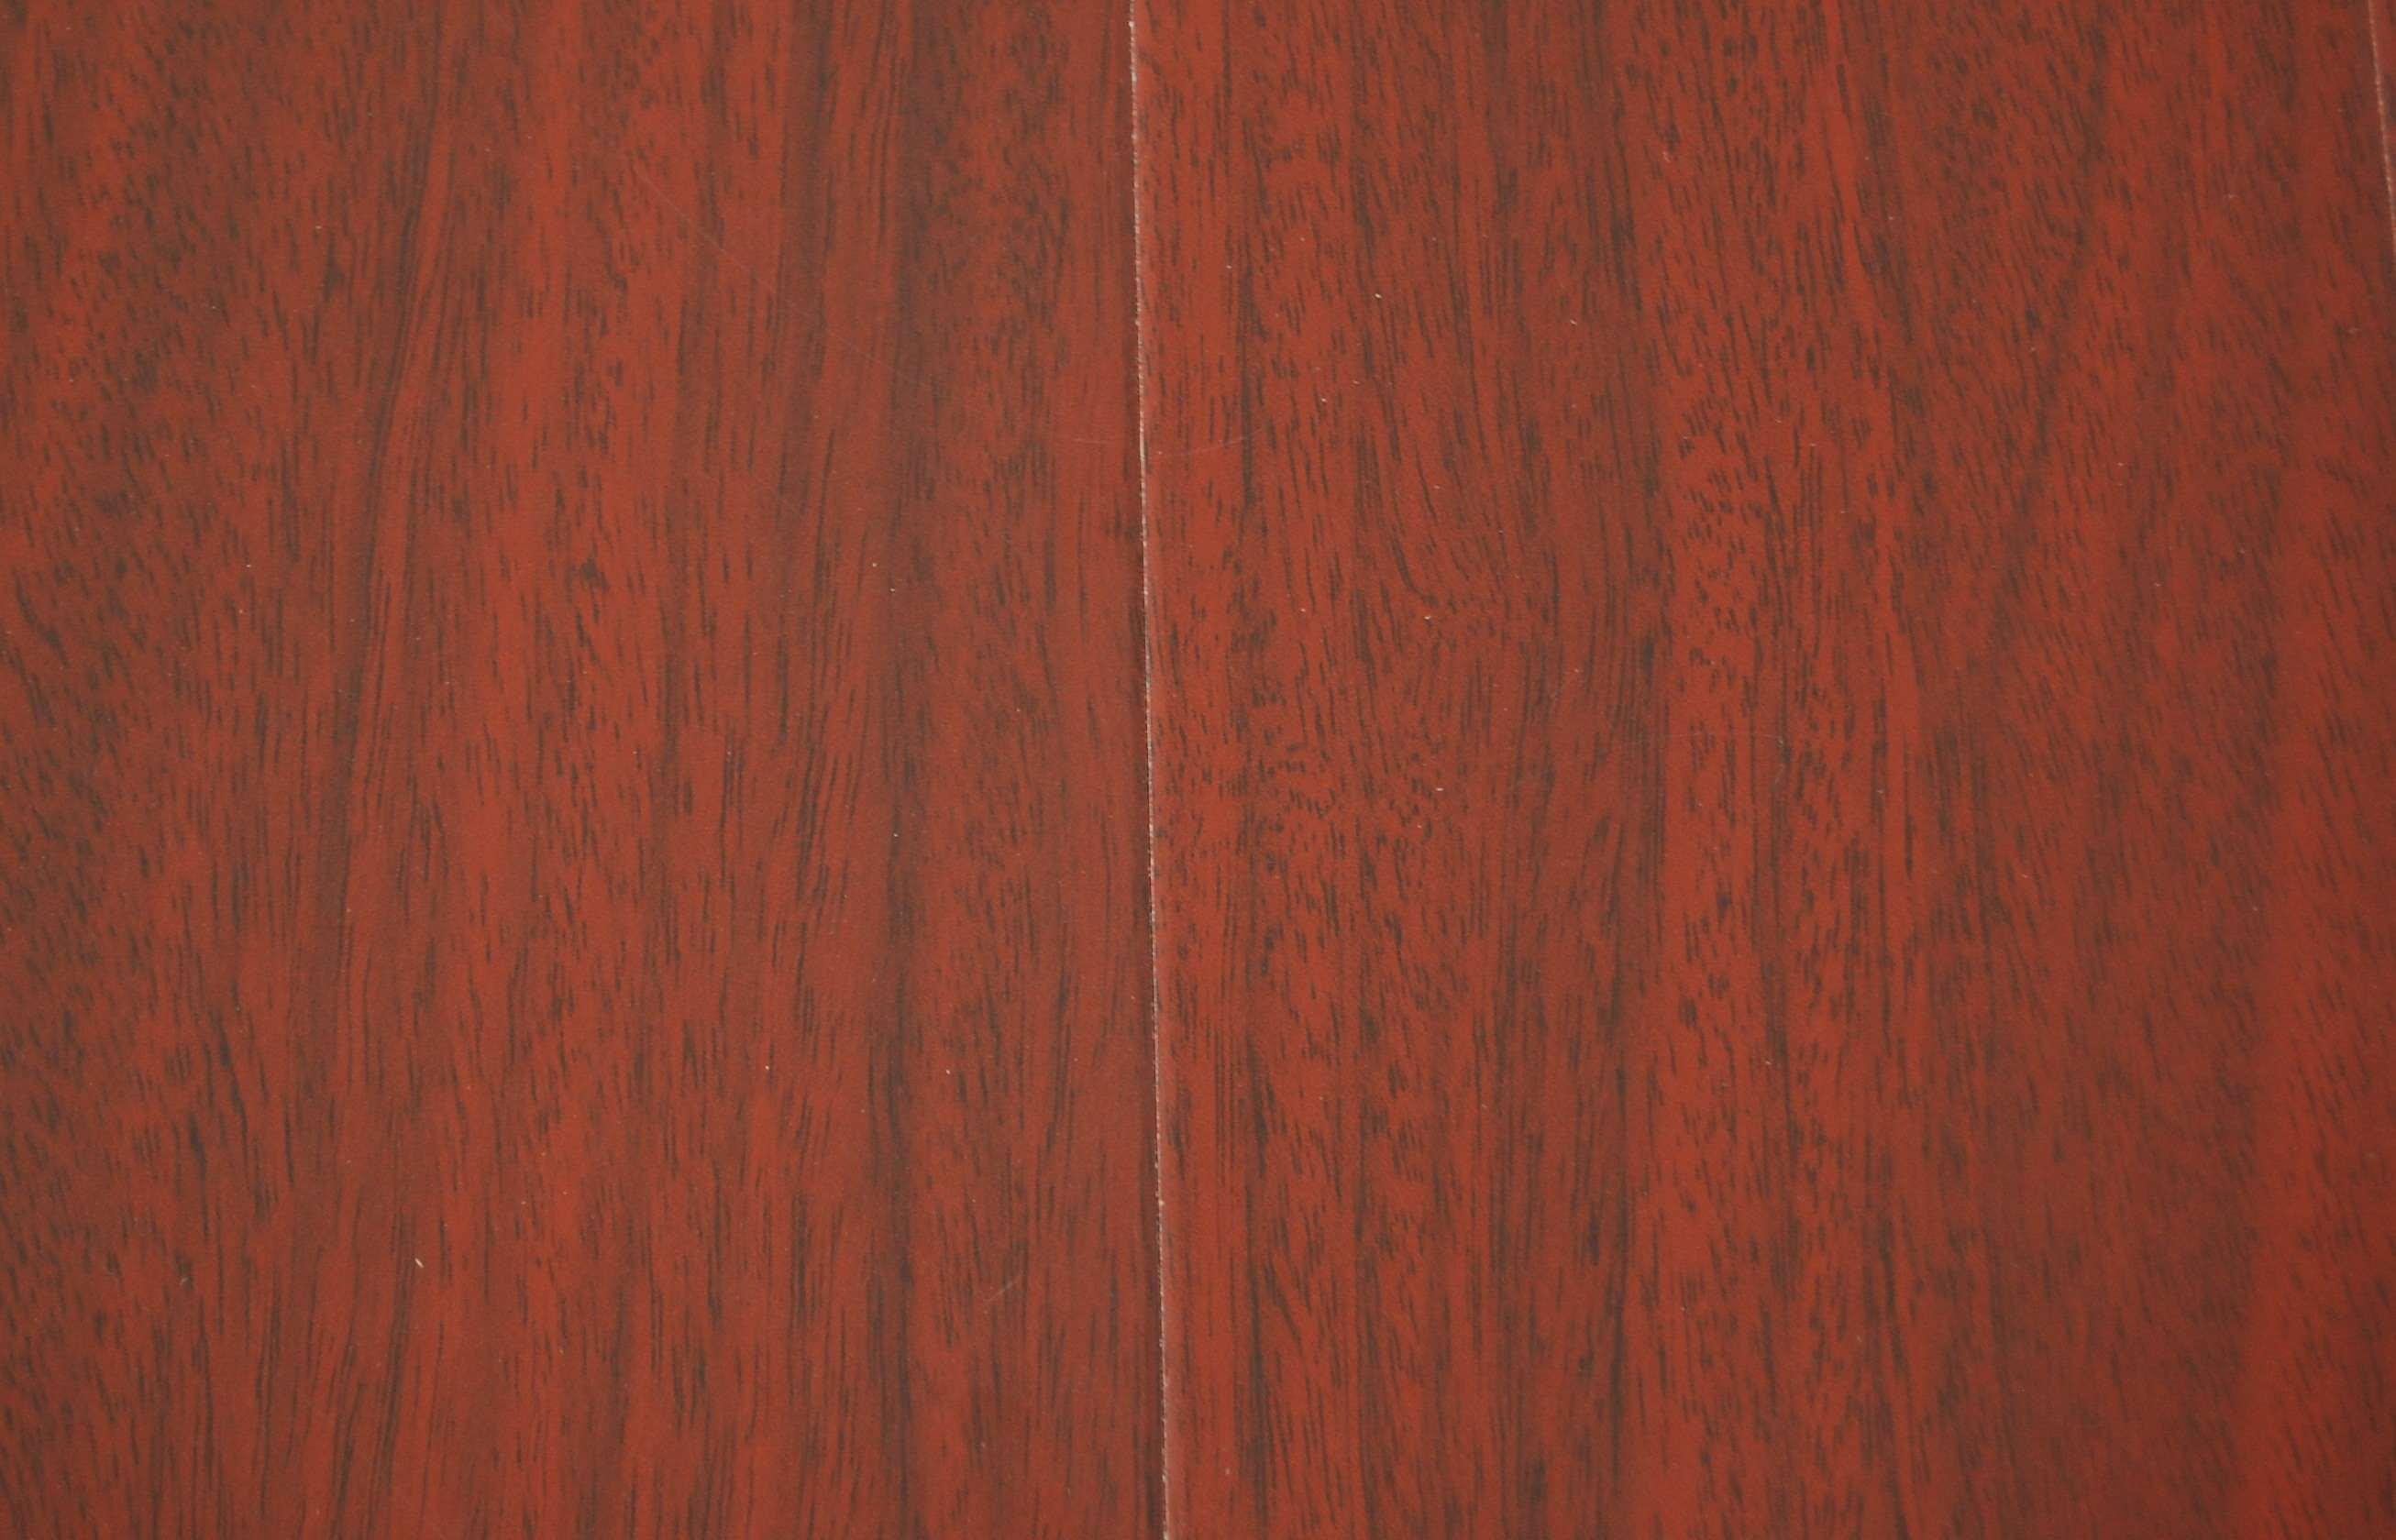 laminated wooden flooring photo - 8